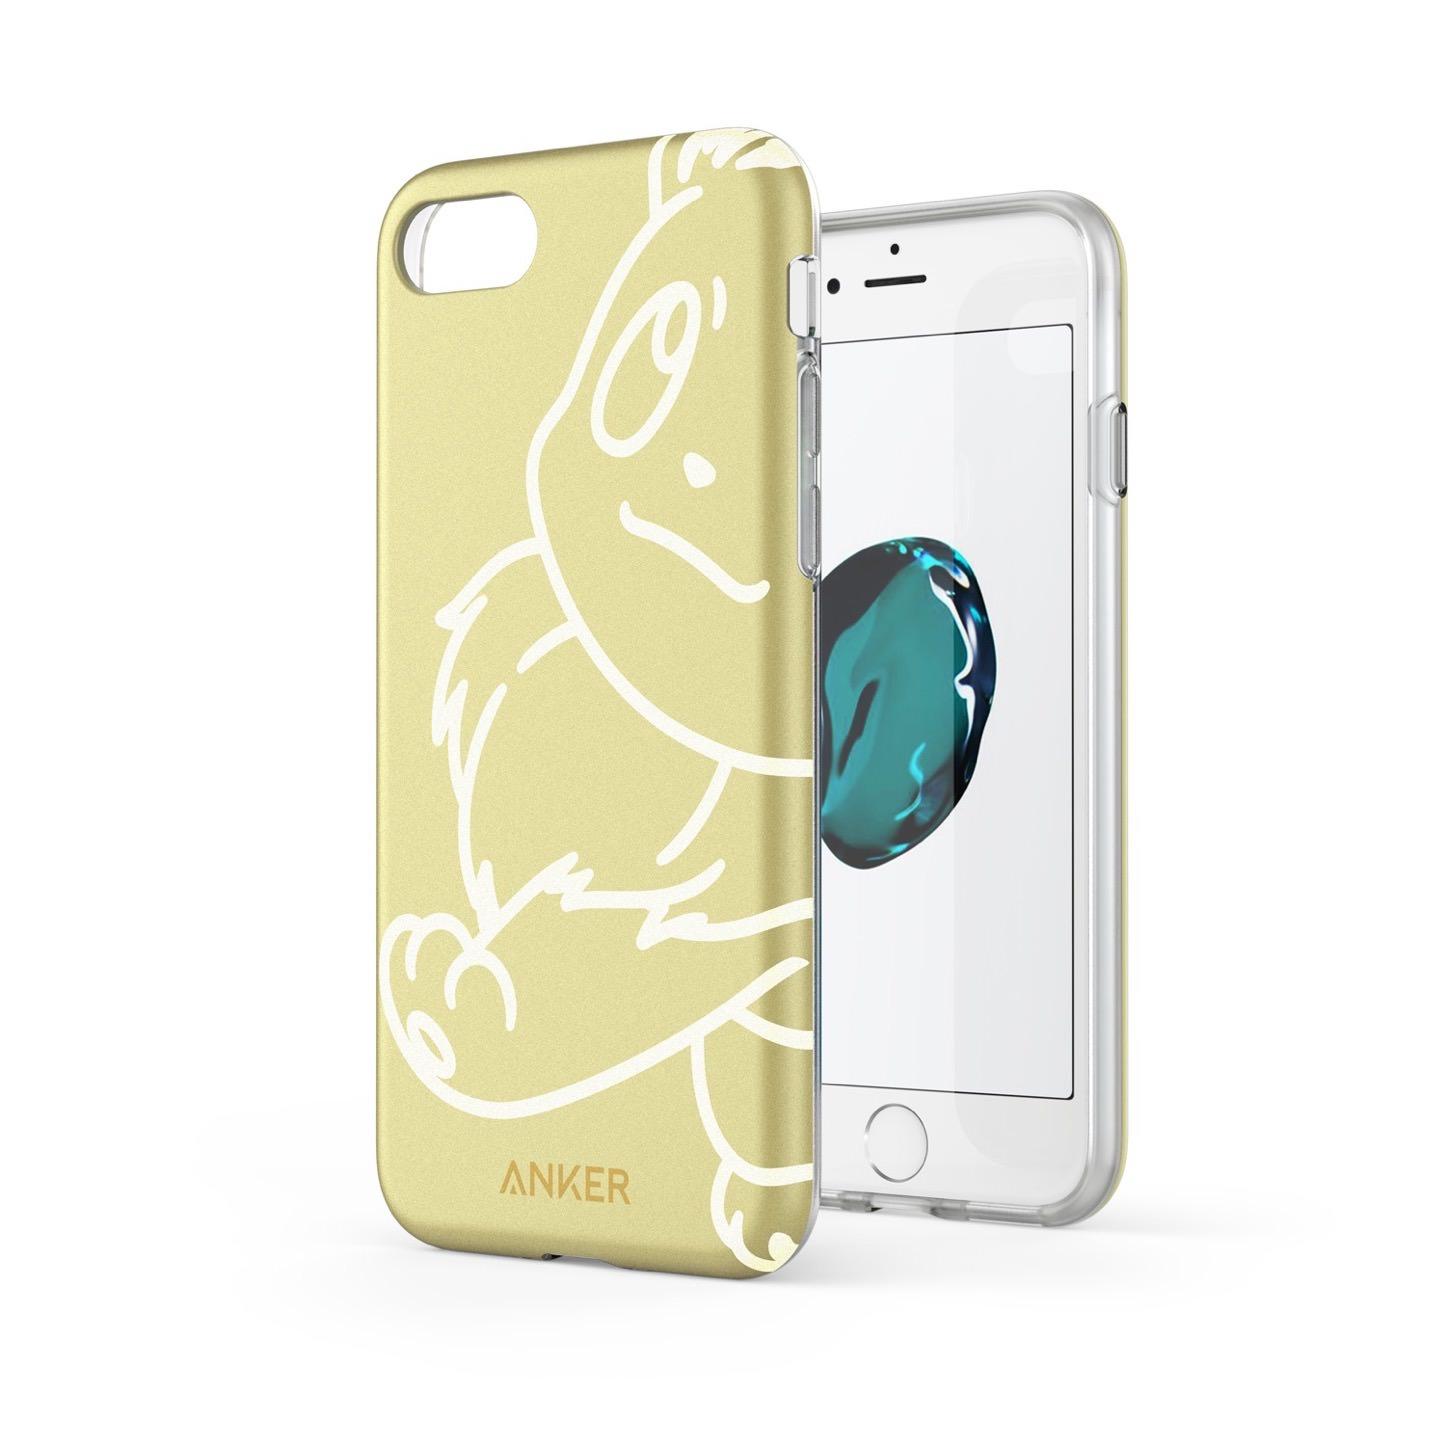 Anker-Pokemon-Mobile-Accessories-13.jpg